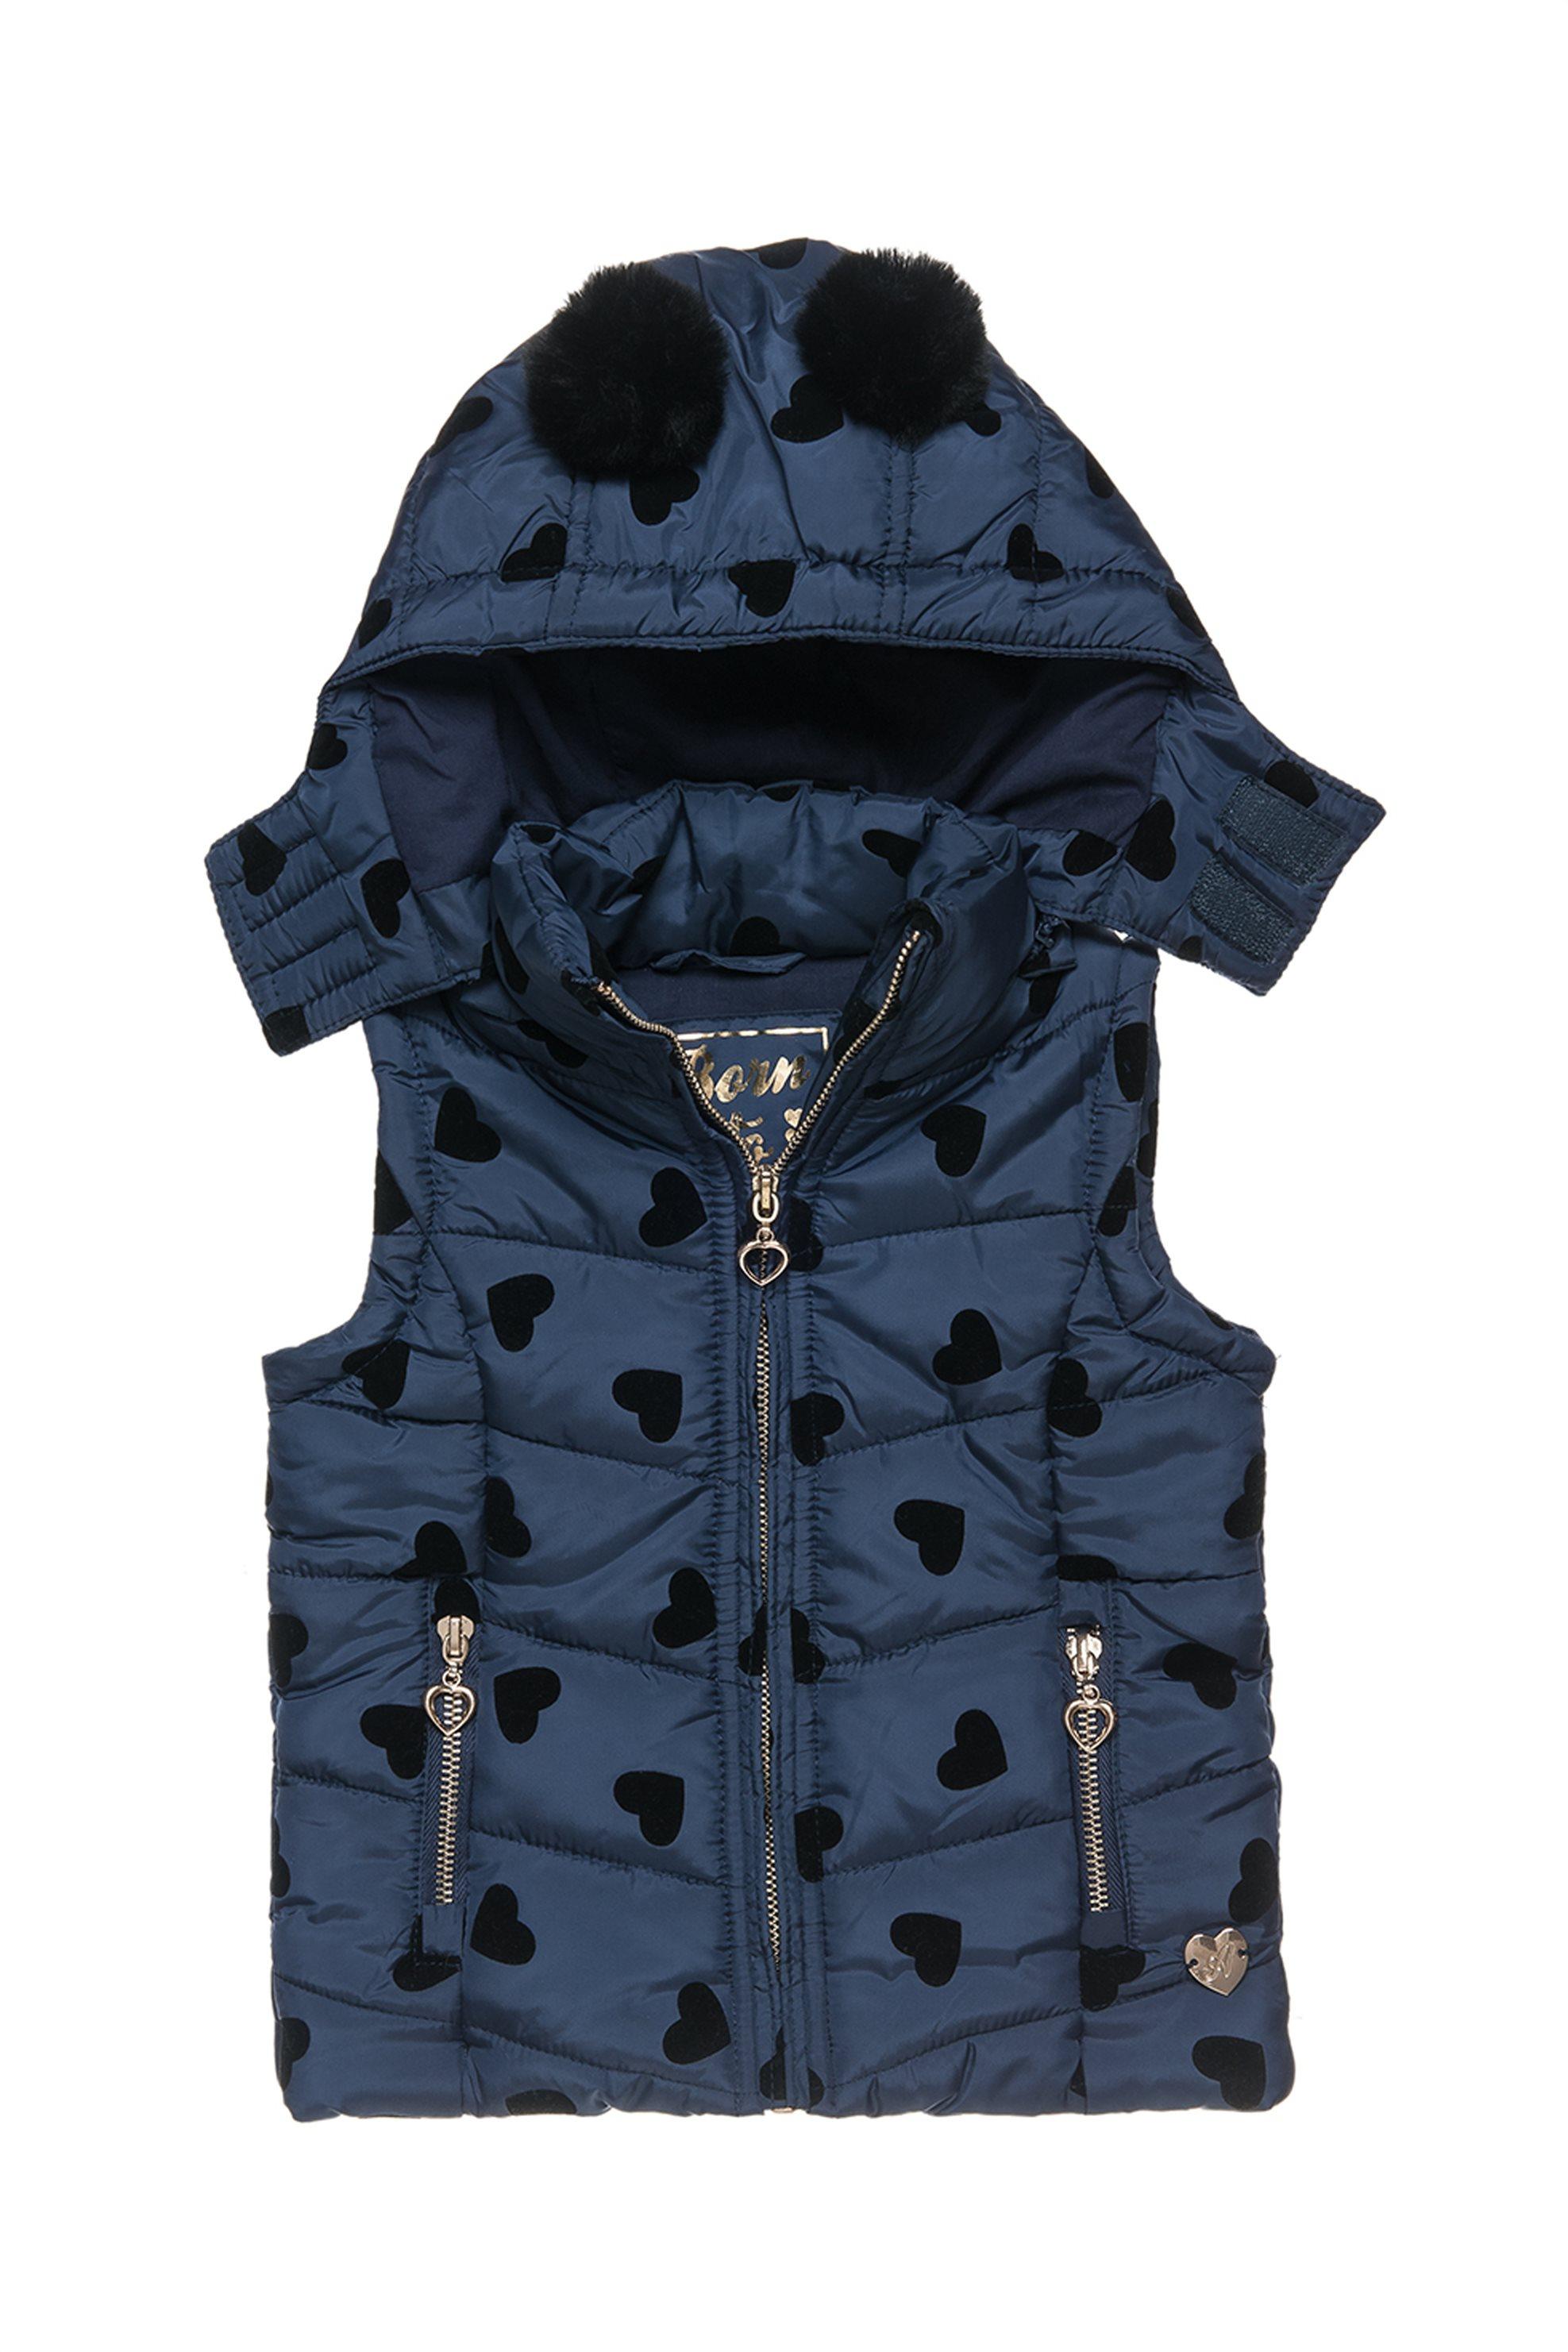 Alouette παιδικό αμάνικο καπιτονέ μπουφάν με print καρδιές - 00251238 - Μπλε Σκο παιδι   βρεφικα κοριτσι   0 3 ετων   κοριτσι   4 14 ετων   παλτό   μπουφάν   ρού